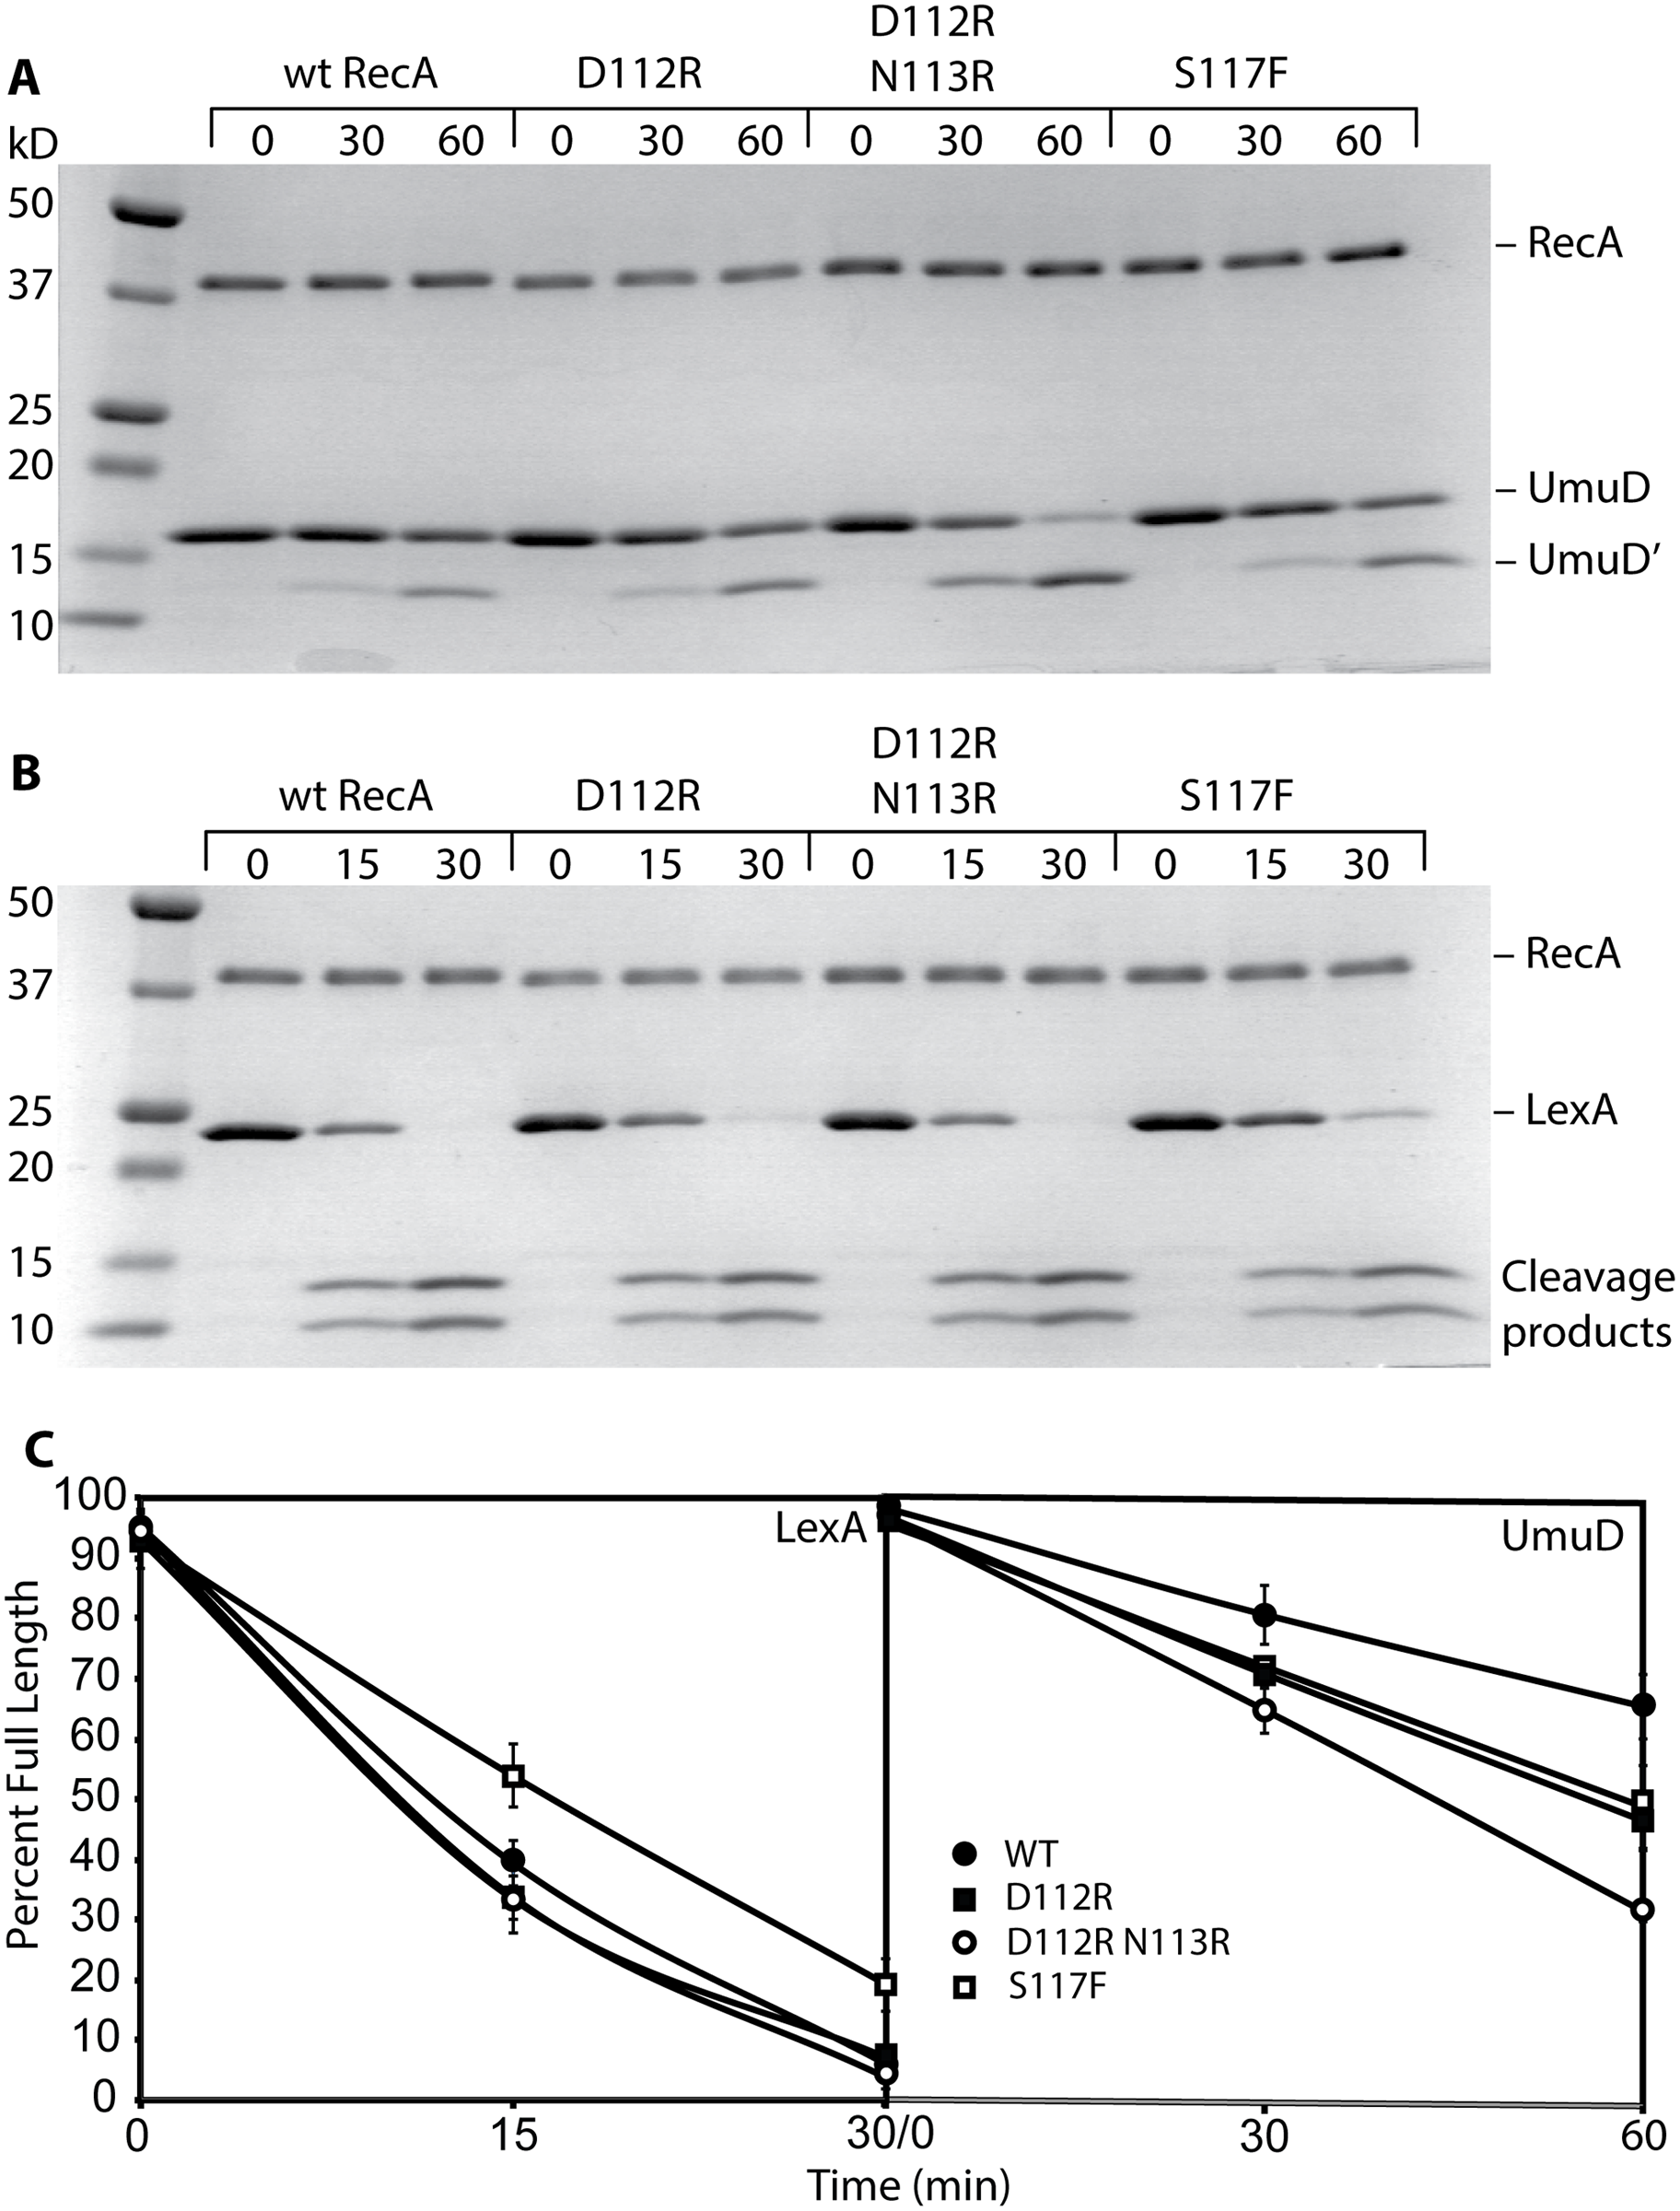 RecA D112R and RecA D112R N113R promote autocatalytic cleavage of LexA and UmuD <i>in vitro</i>.